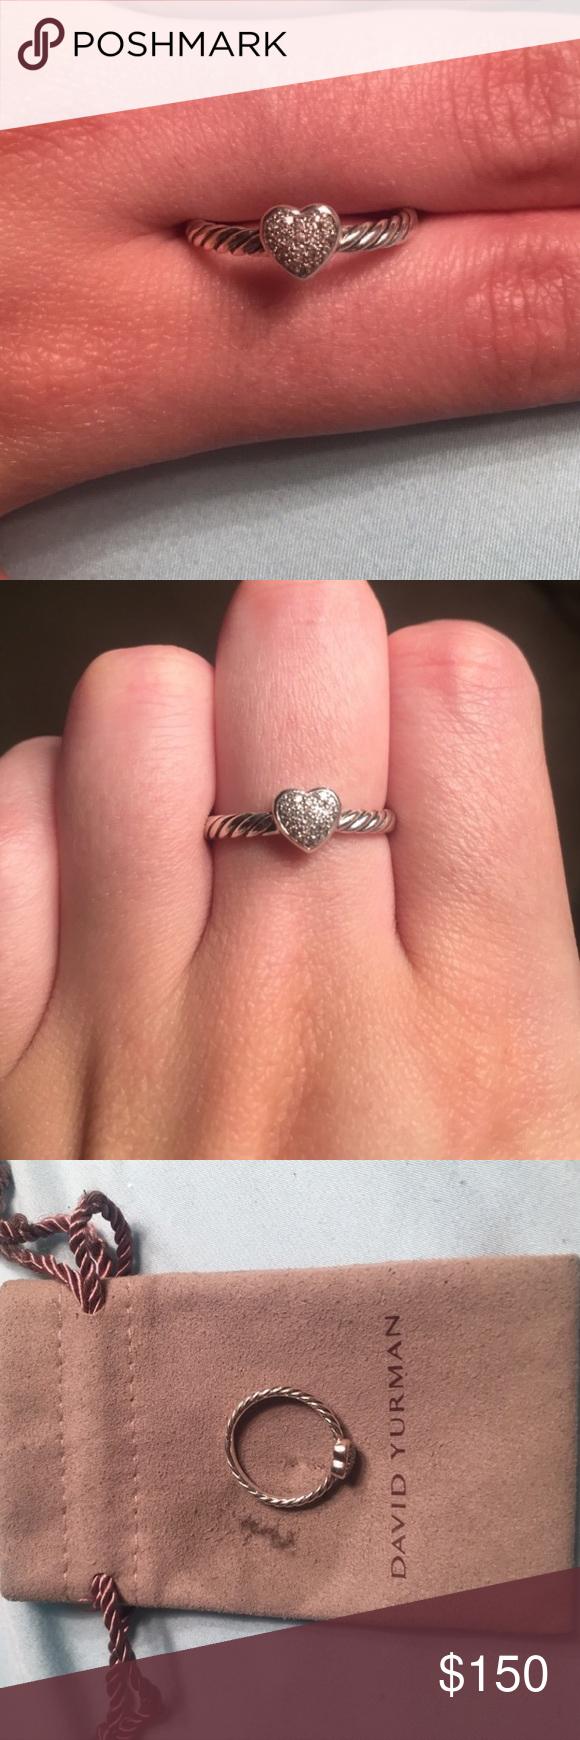 7a7b5dcf700b73 Authentic David Yurman Petite Pave Ring Authentic David Yurman petite pave  diamond heart ring. 0.06 total carat weight. All diamonds intact.